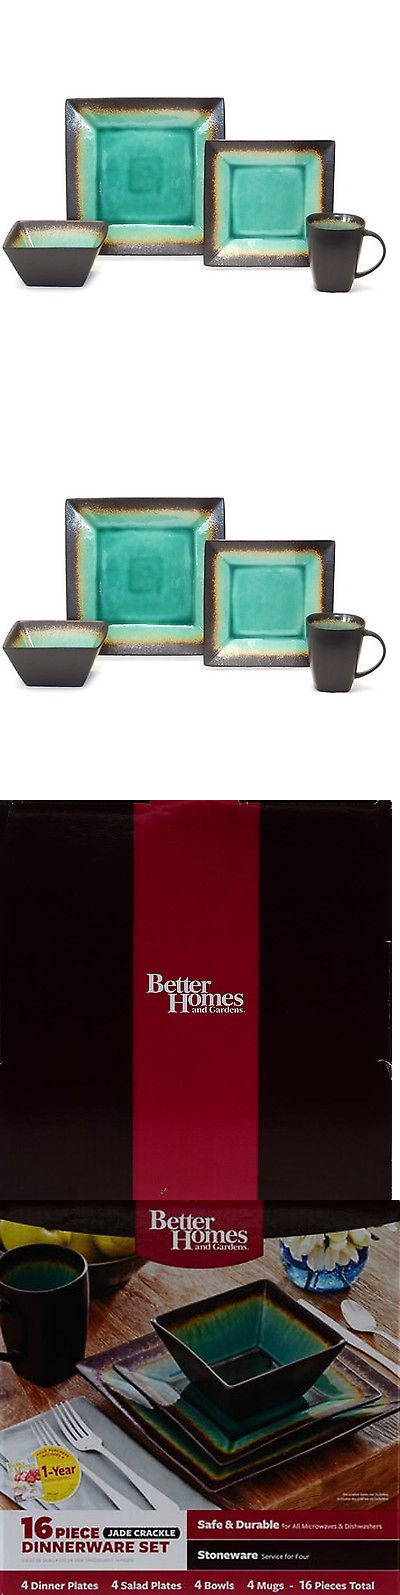 Dinner Service Sets 36032: Better Homes And Gardens Jade Crackle 16 ...